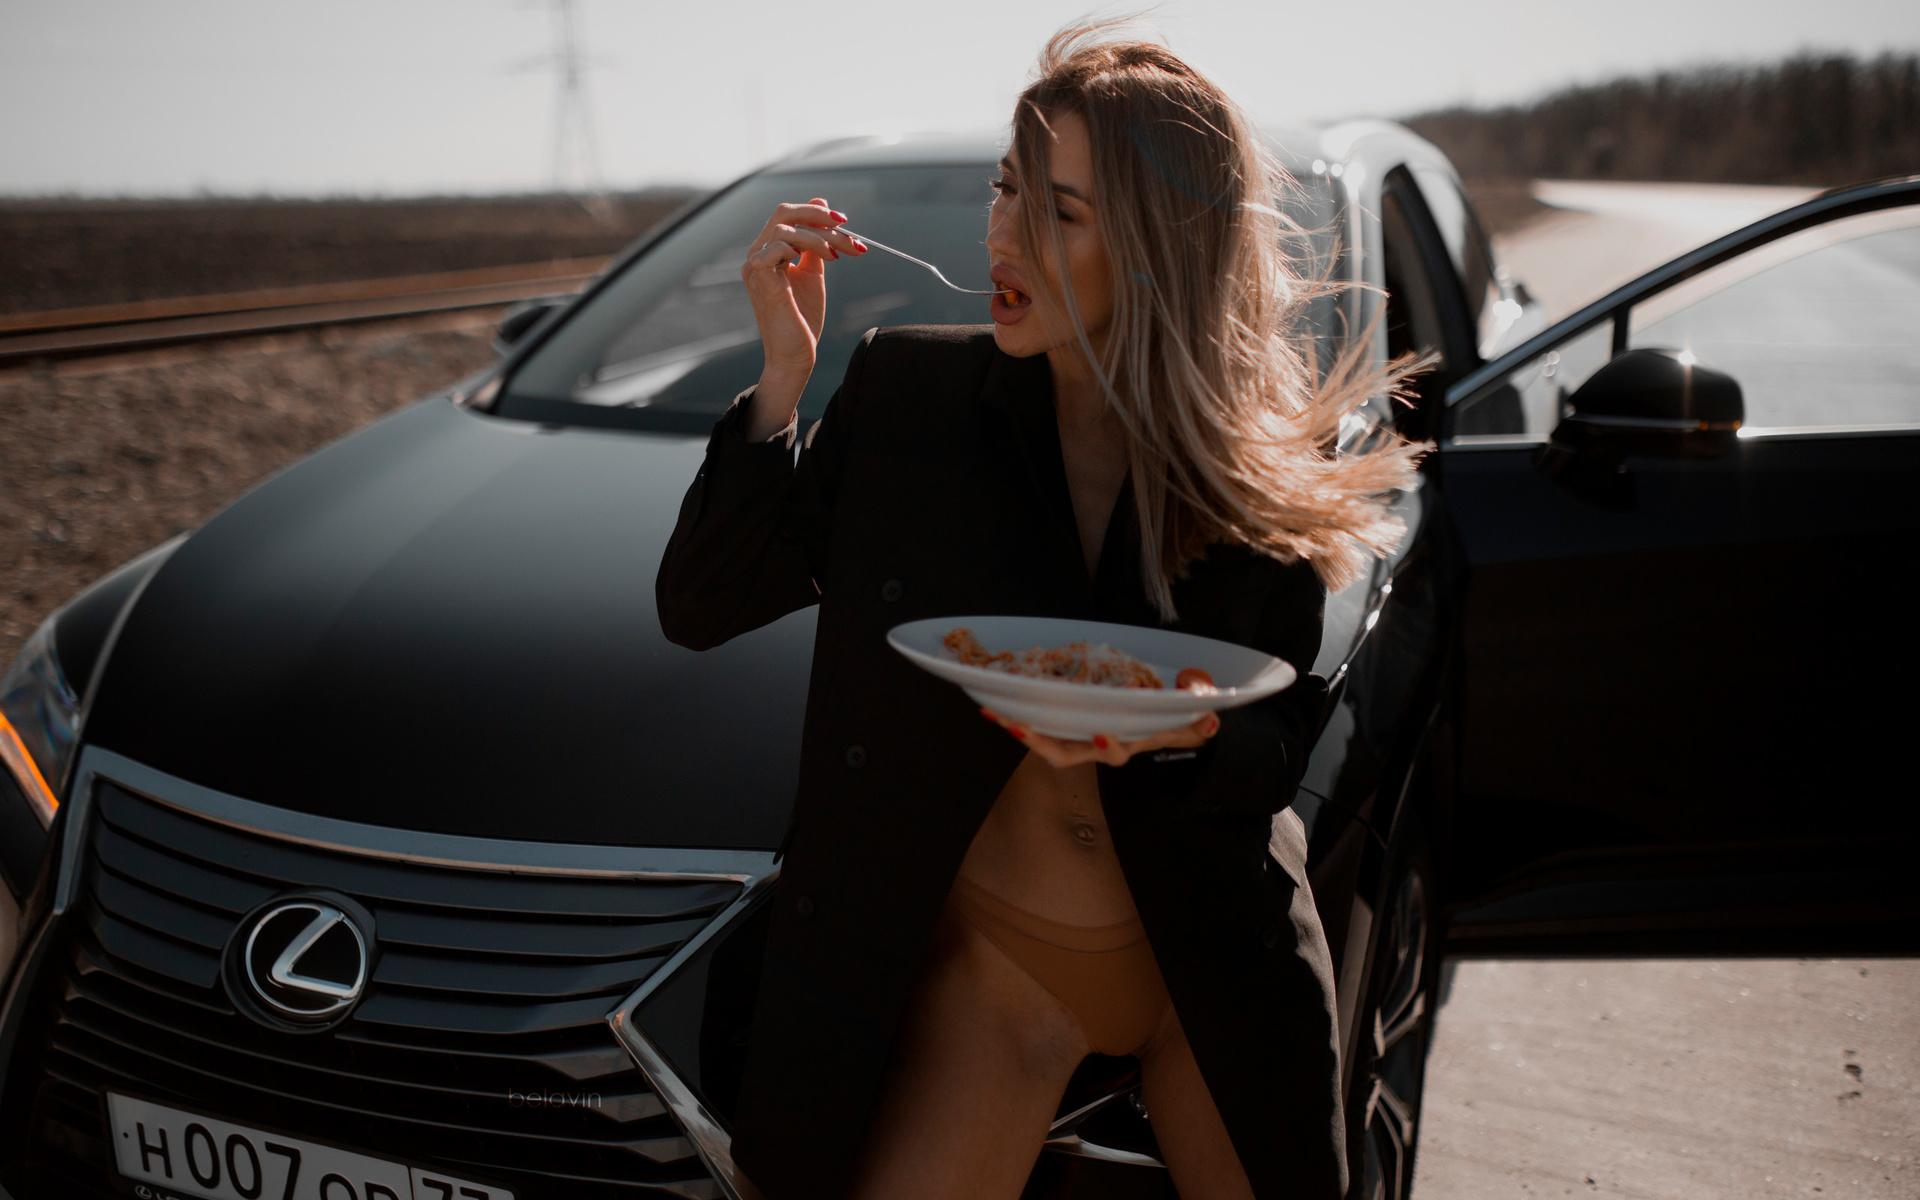 women, alexander belavin, red nails, coats, fork, panties, car, women outdoors, open mouth, food, women with cars, belly, brunette